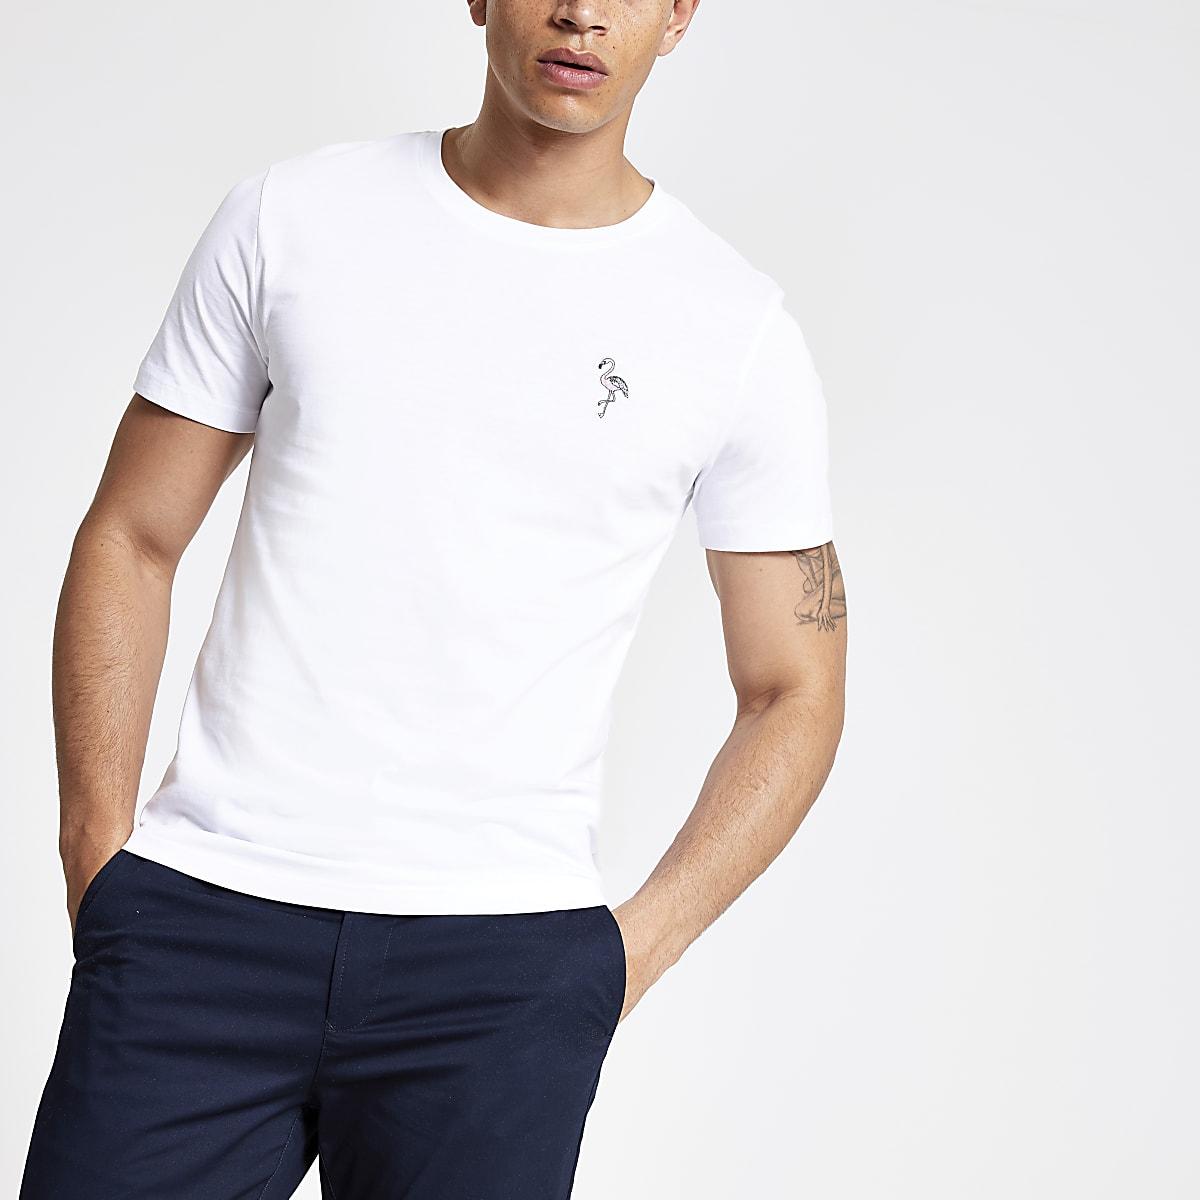 Selected Homme - Wit T-shirt met flamingoprint